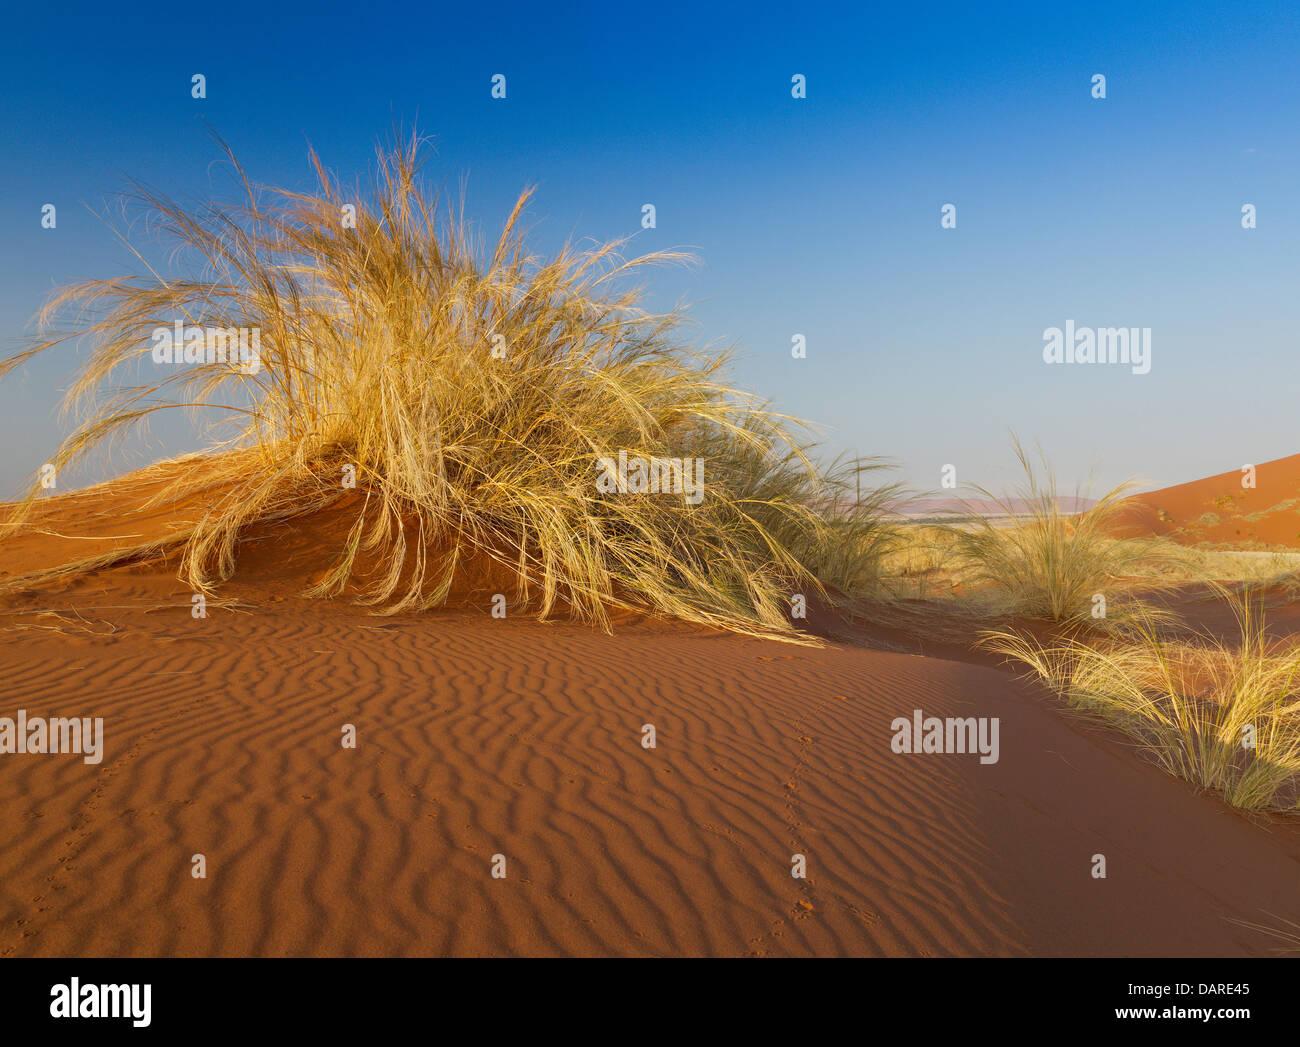 Dune grasses, Sossuspoort lookout in the Namib Naukluft Desert Park, Namibia - Stock Image